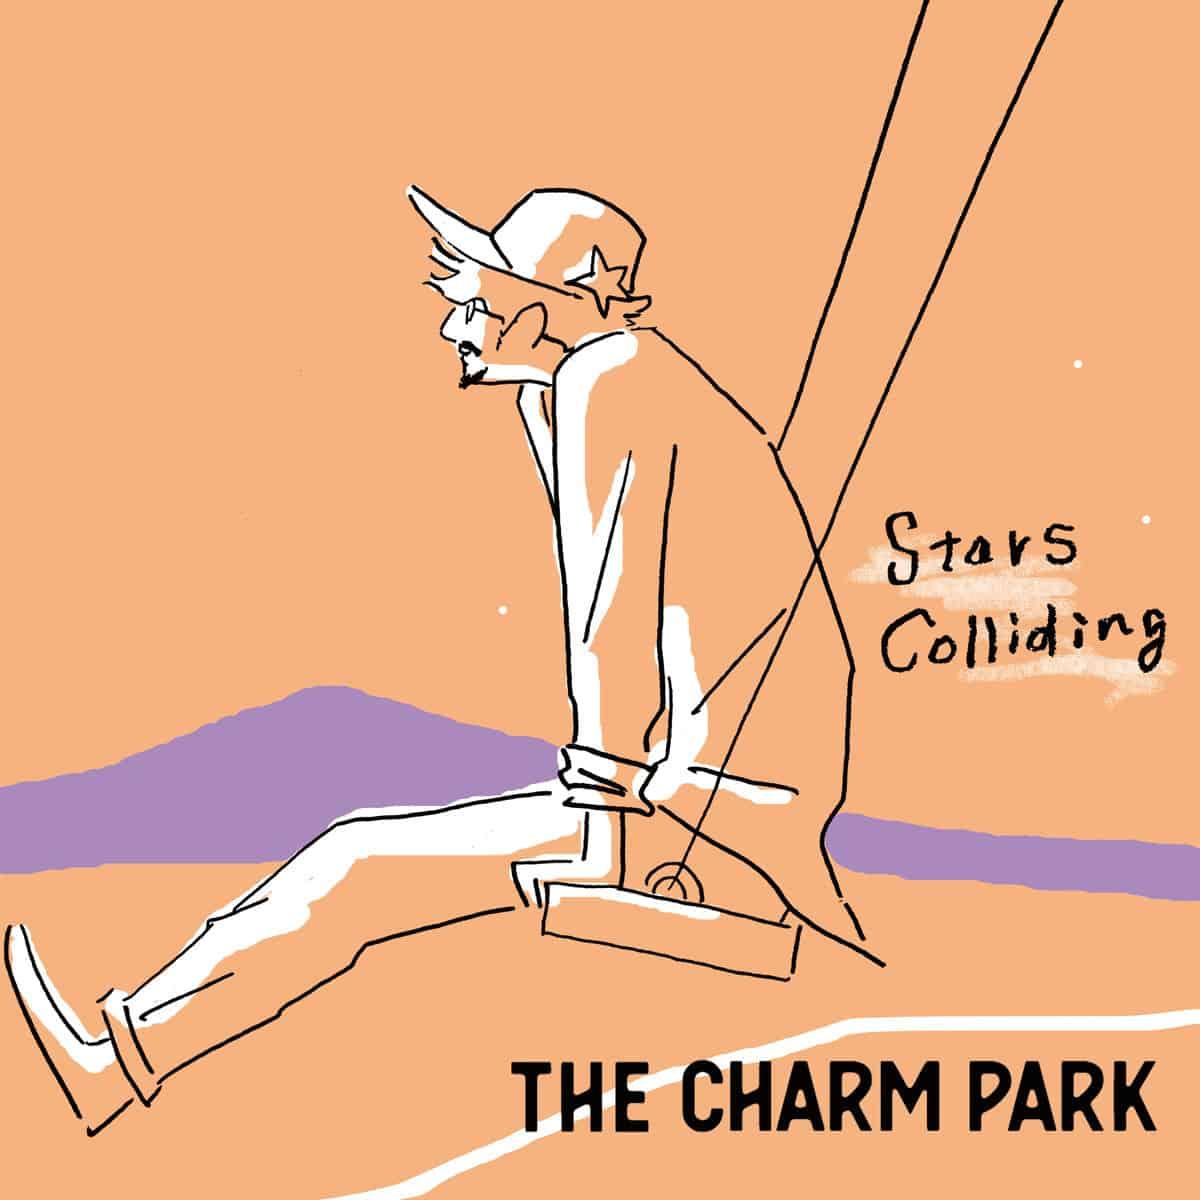 『THE CHARM PARK - Stars Colliding』収録の『Stars Colliding』ジャケット